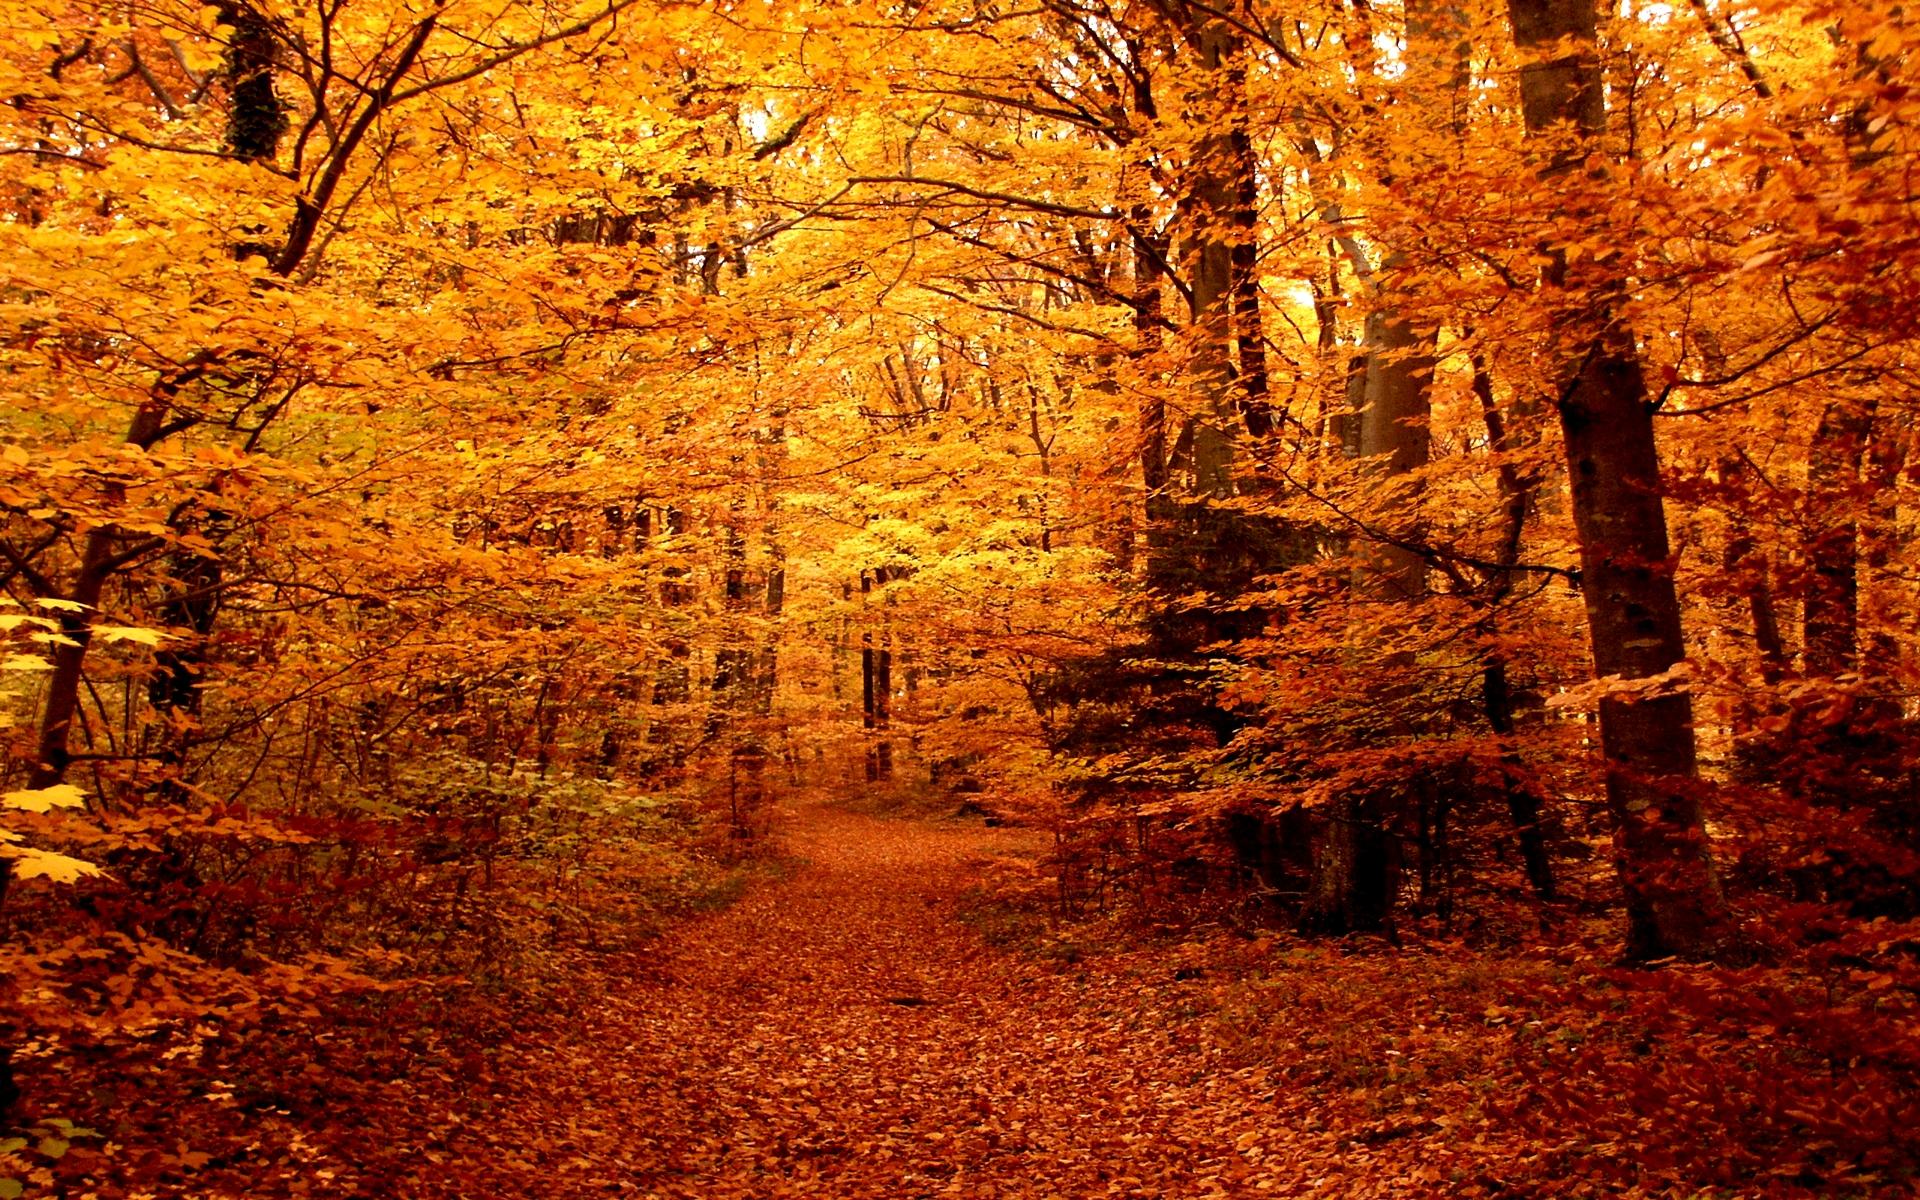 Autumn forest path